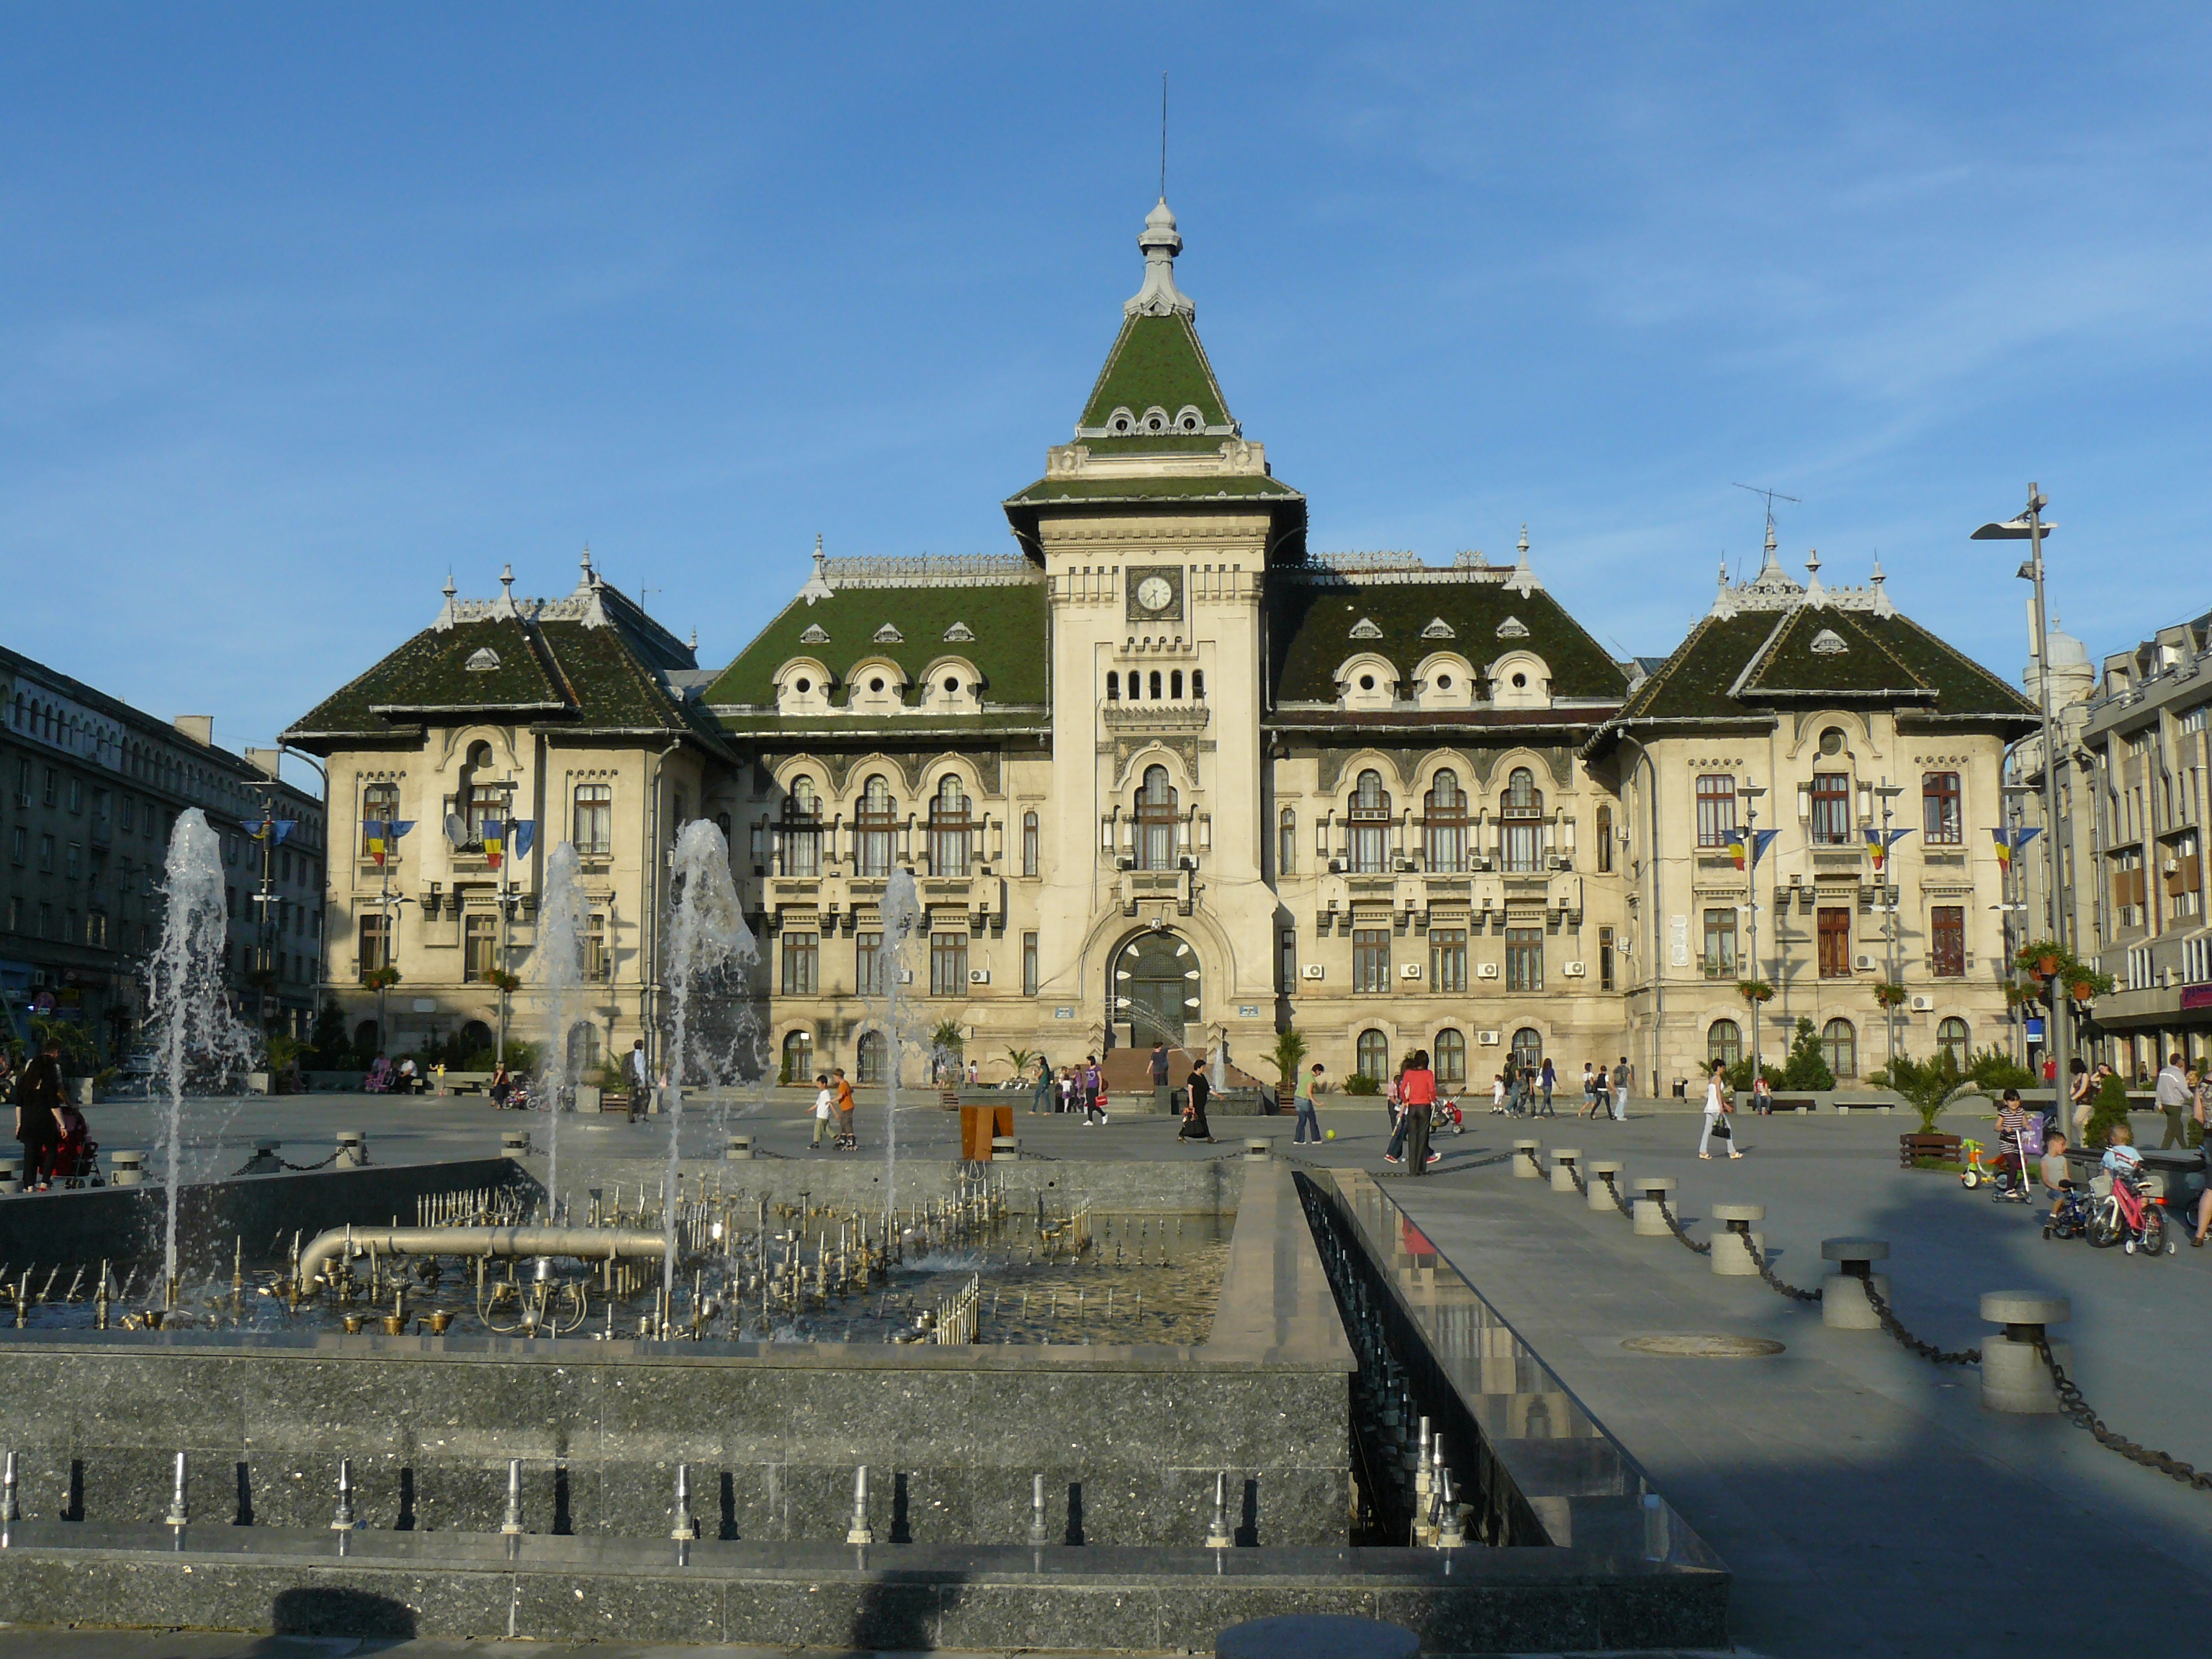 Craiova Romania  city photos gallery : correlati craiova romania 2576 x 1629 935 kb jpeg craiova romania ...